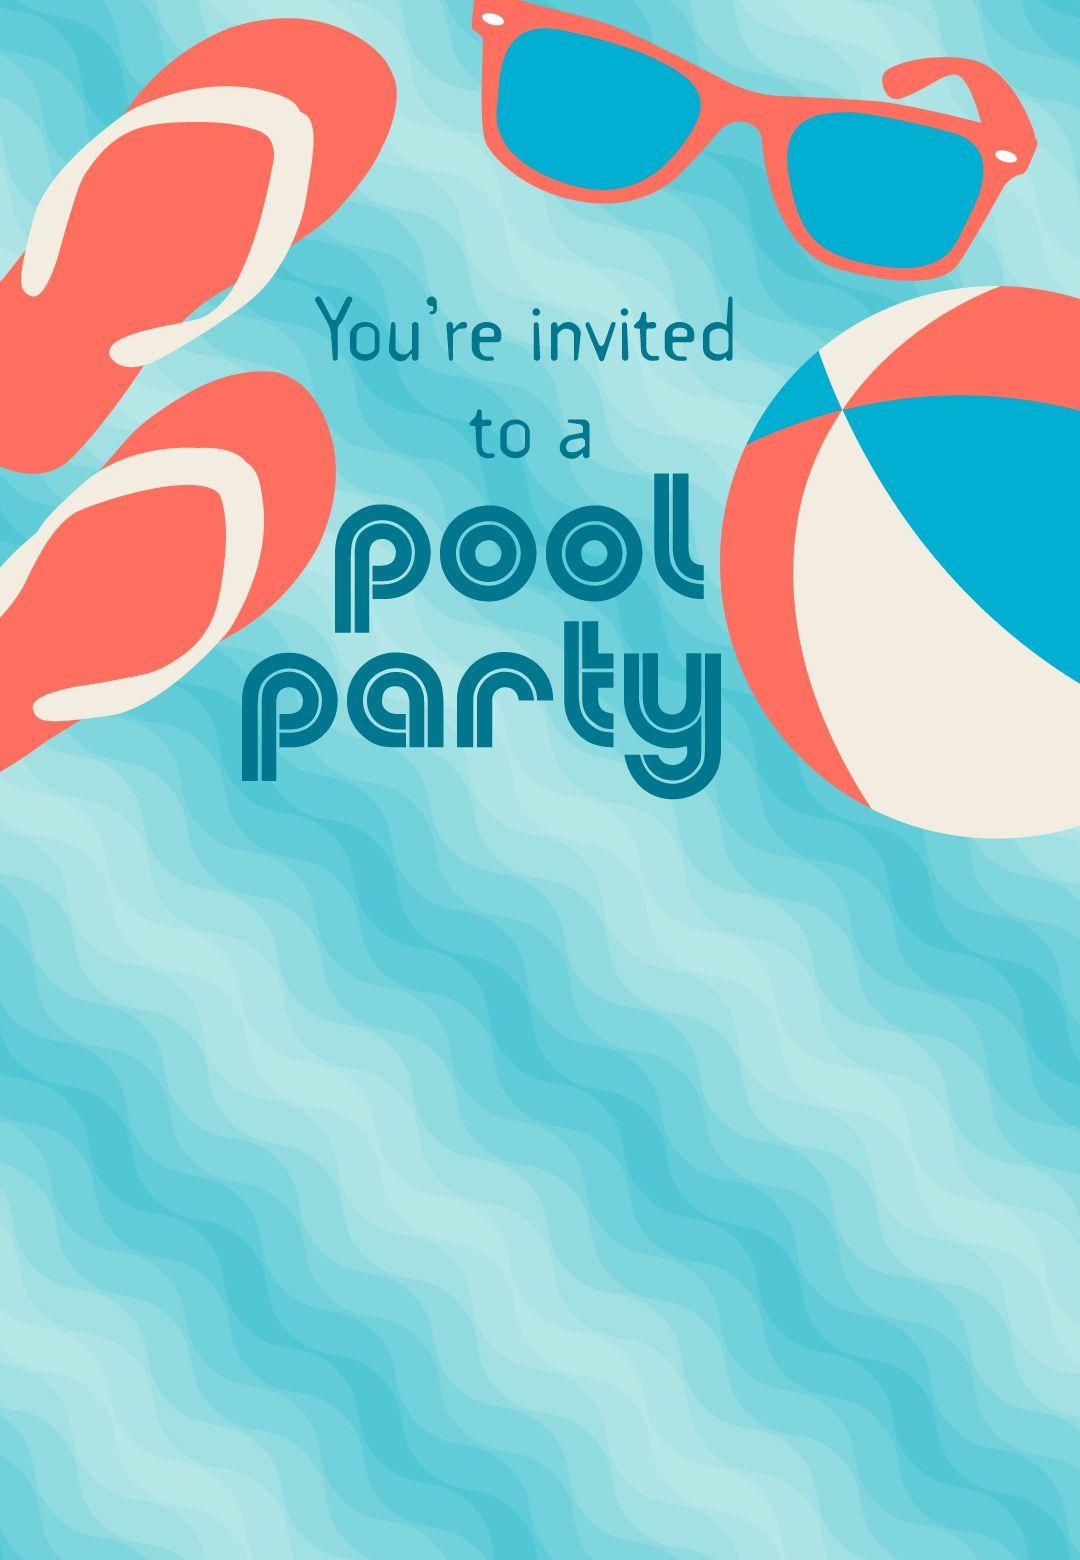 Free Printable Pool Party Stuff Invitation | Pool Party | Pinterest ...